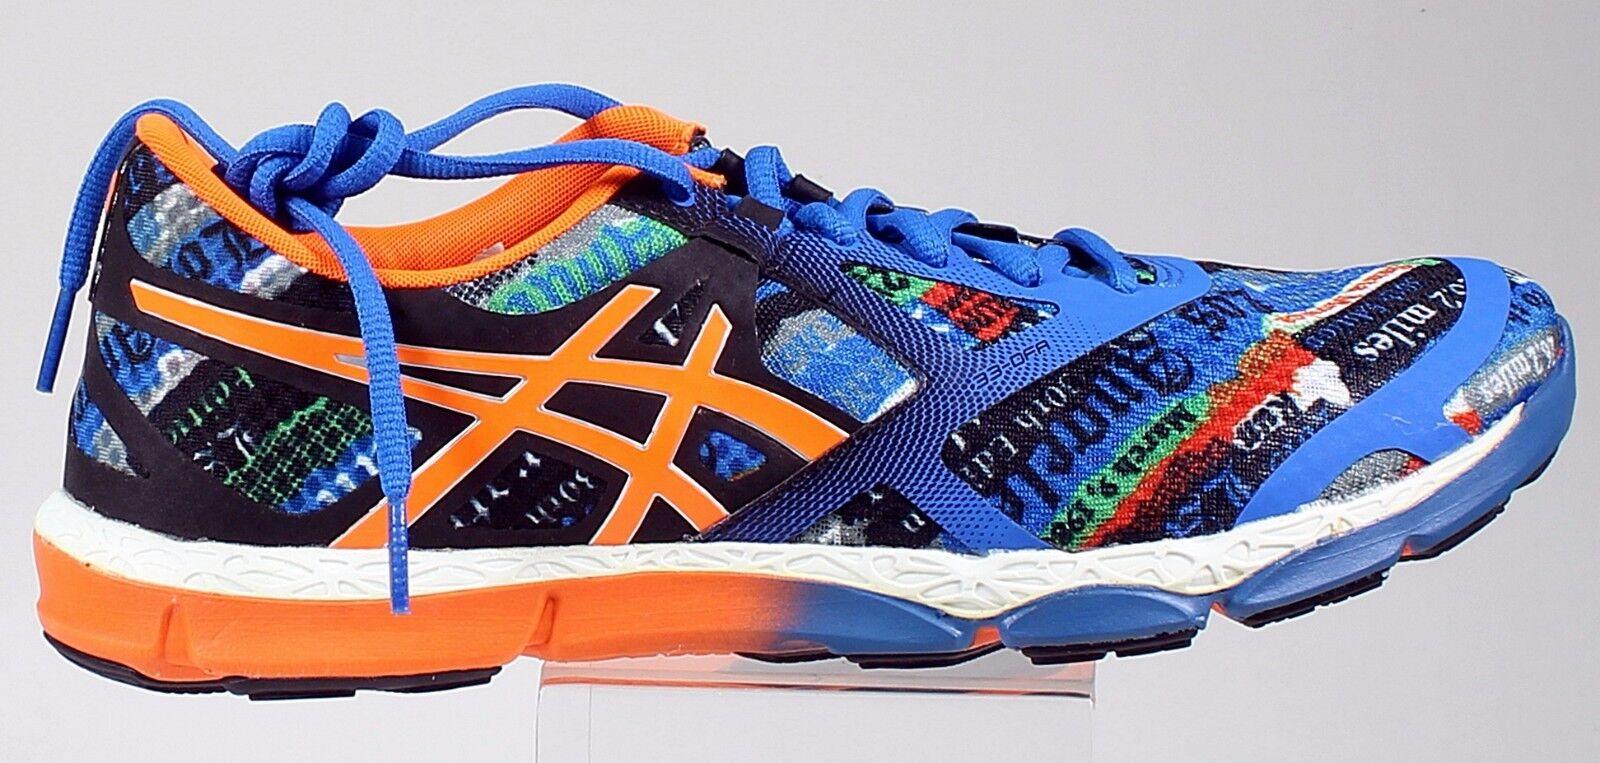 Asics 2015 LA maratón para hombres Zapatos Deportivos Tallas US gráficos intensos Graffiti